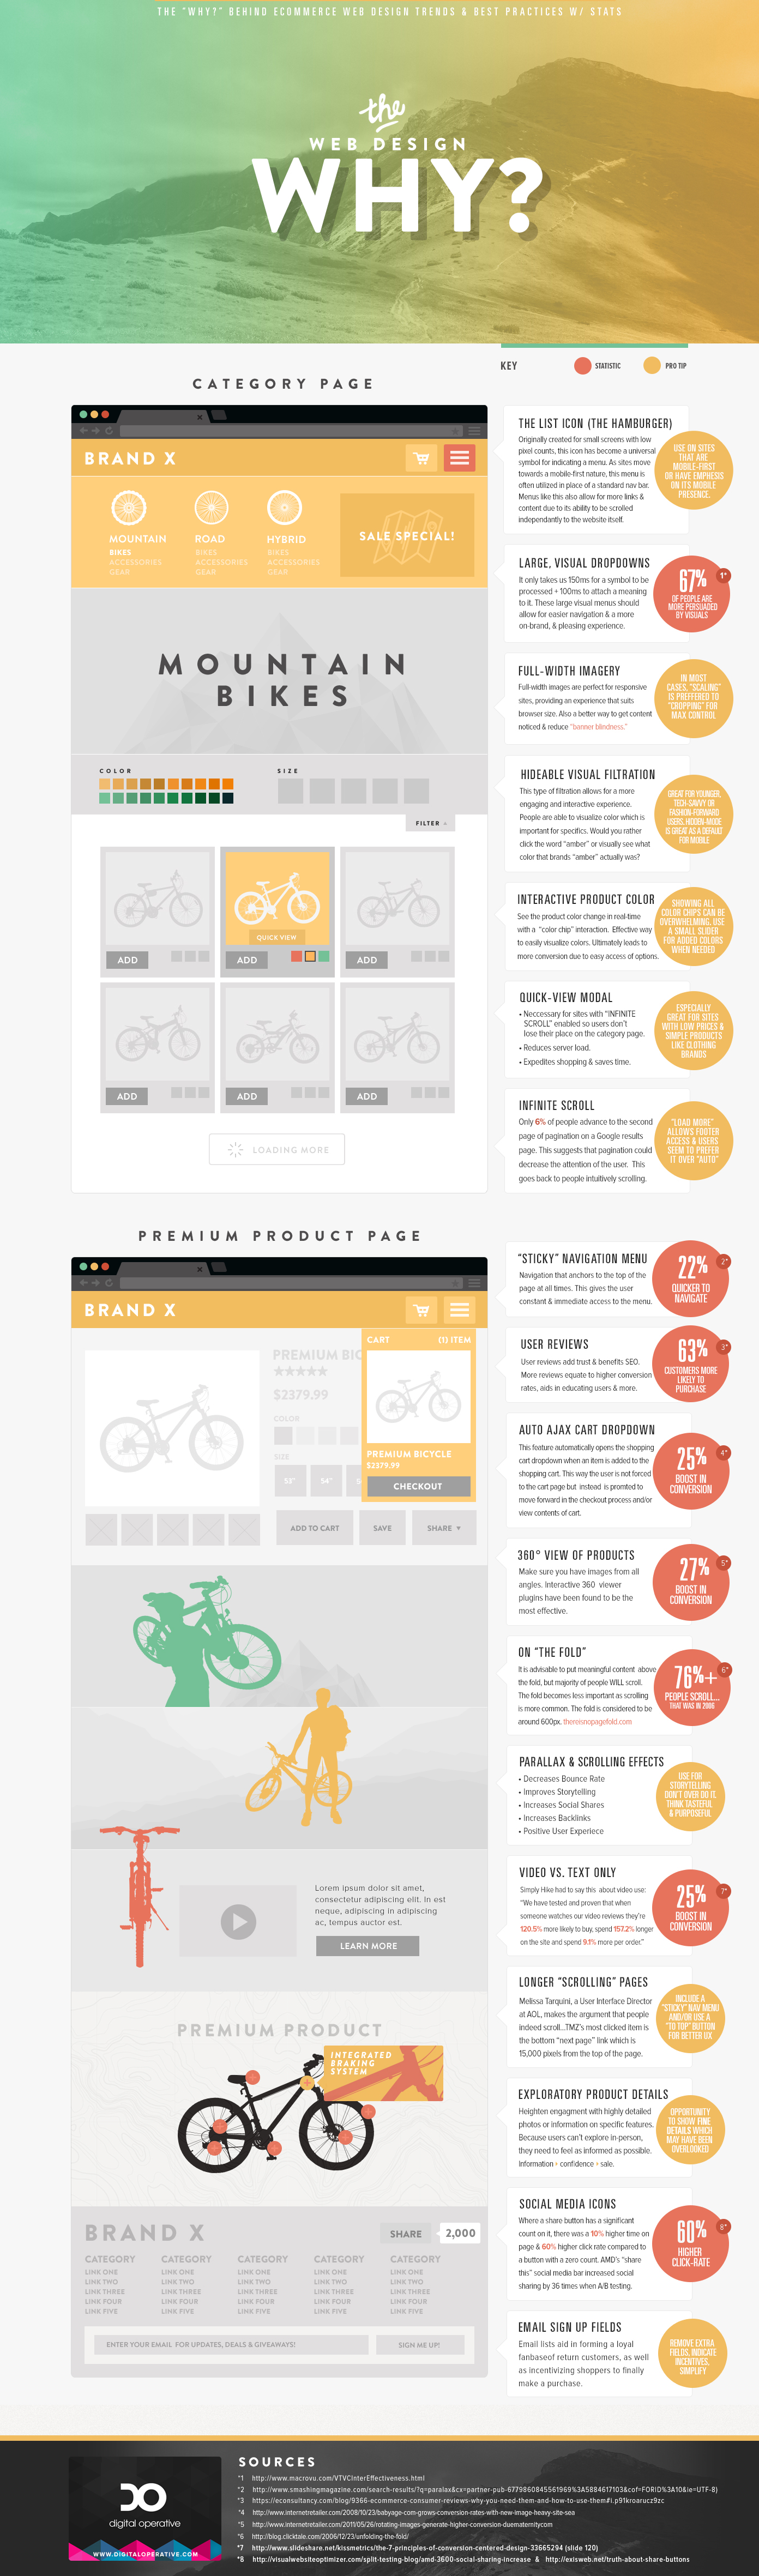 Web-Design-Graphic